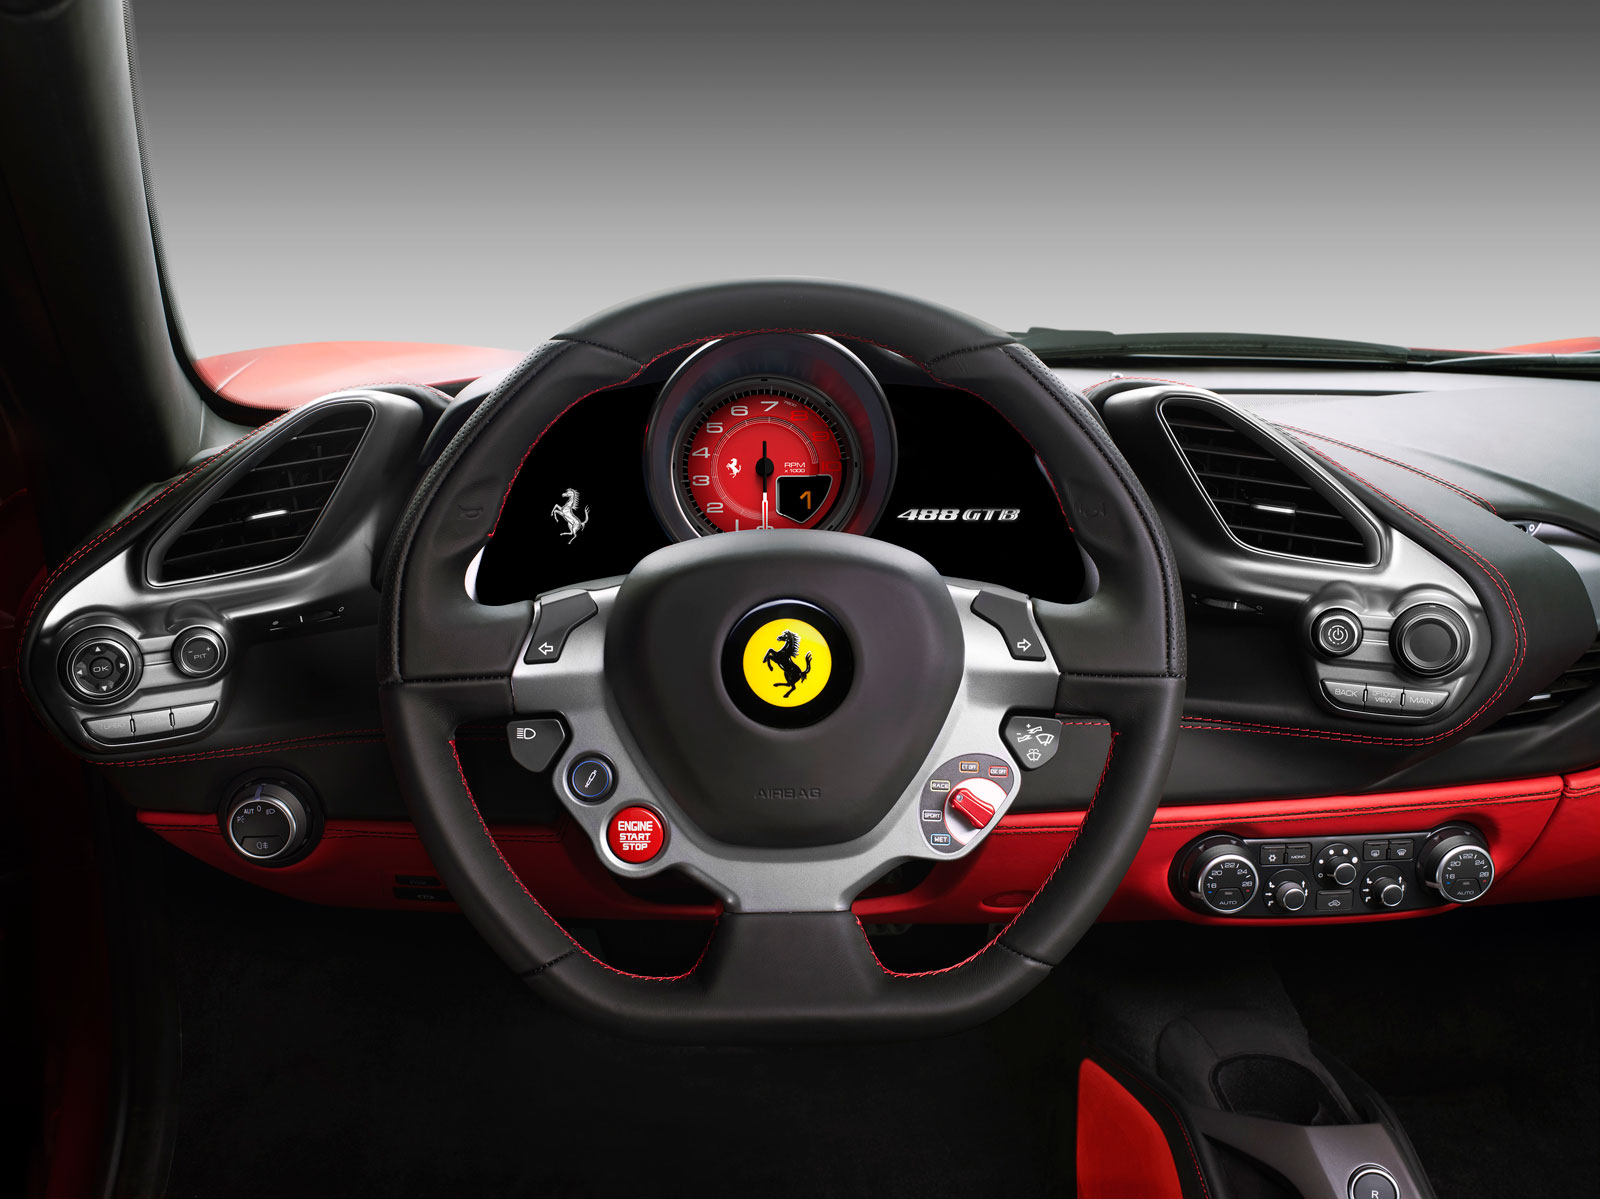 Ferrari-488-GTB-Cockpit.jpg